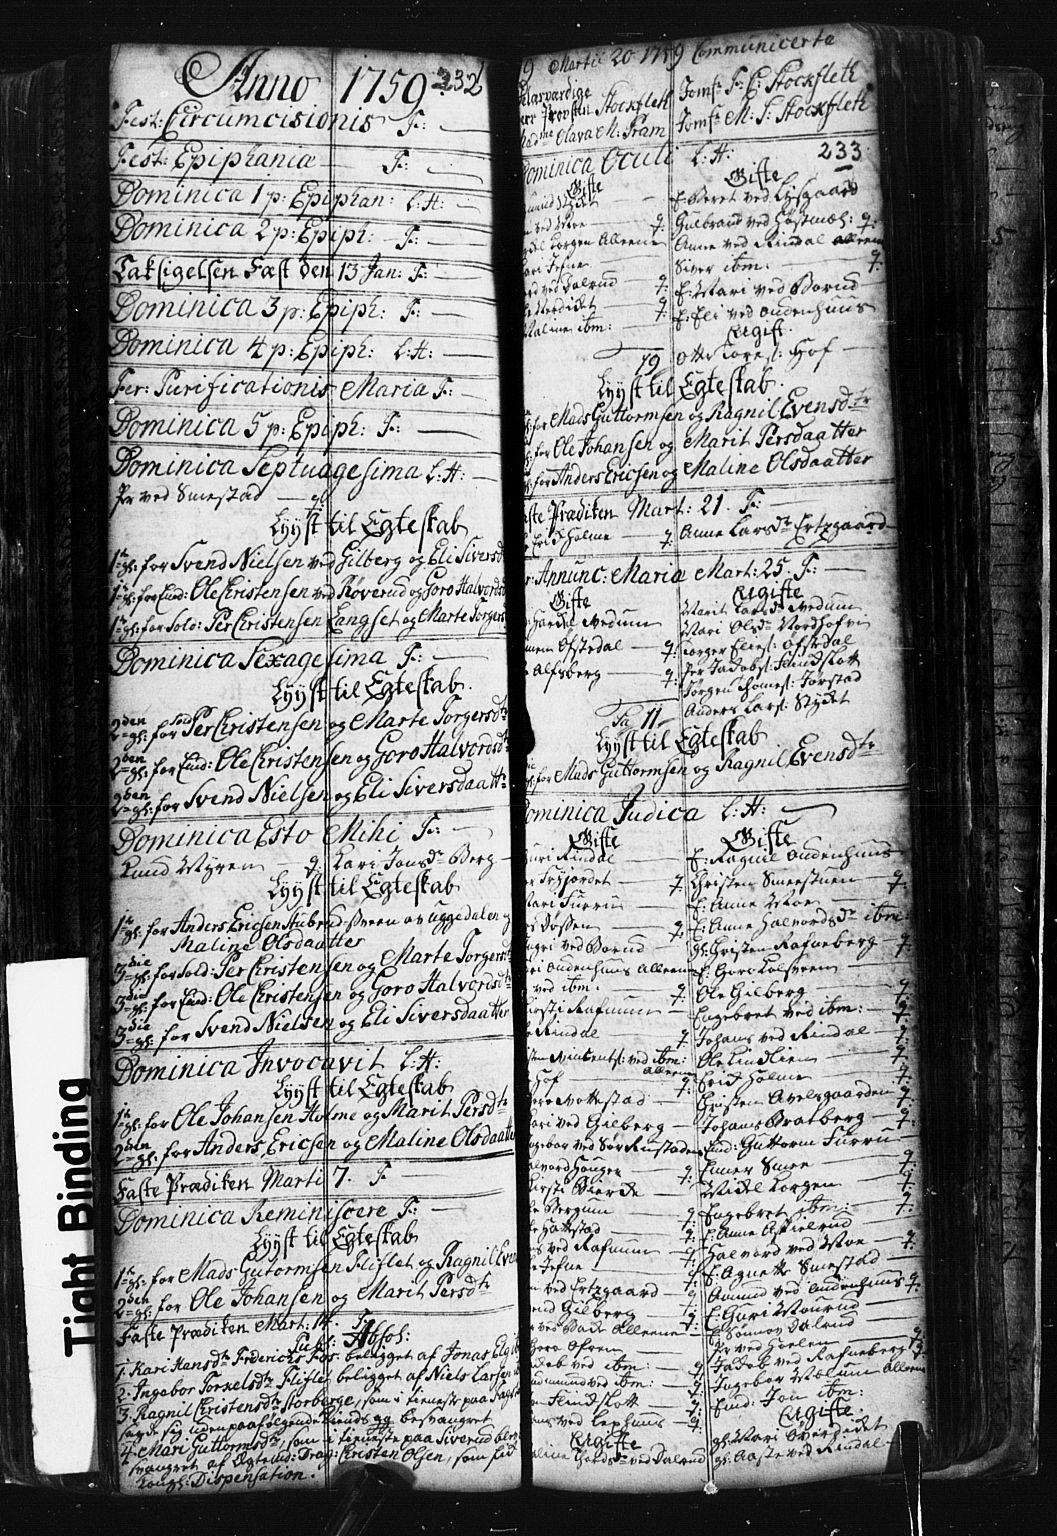 SAH, Fåberg prestekontor, Klokkerbok nr. 1, 1727-1767, s. 232-233